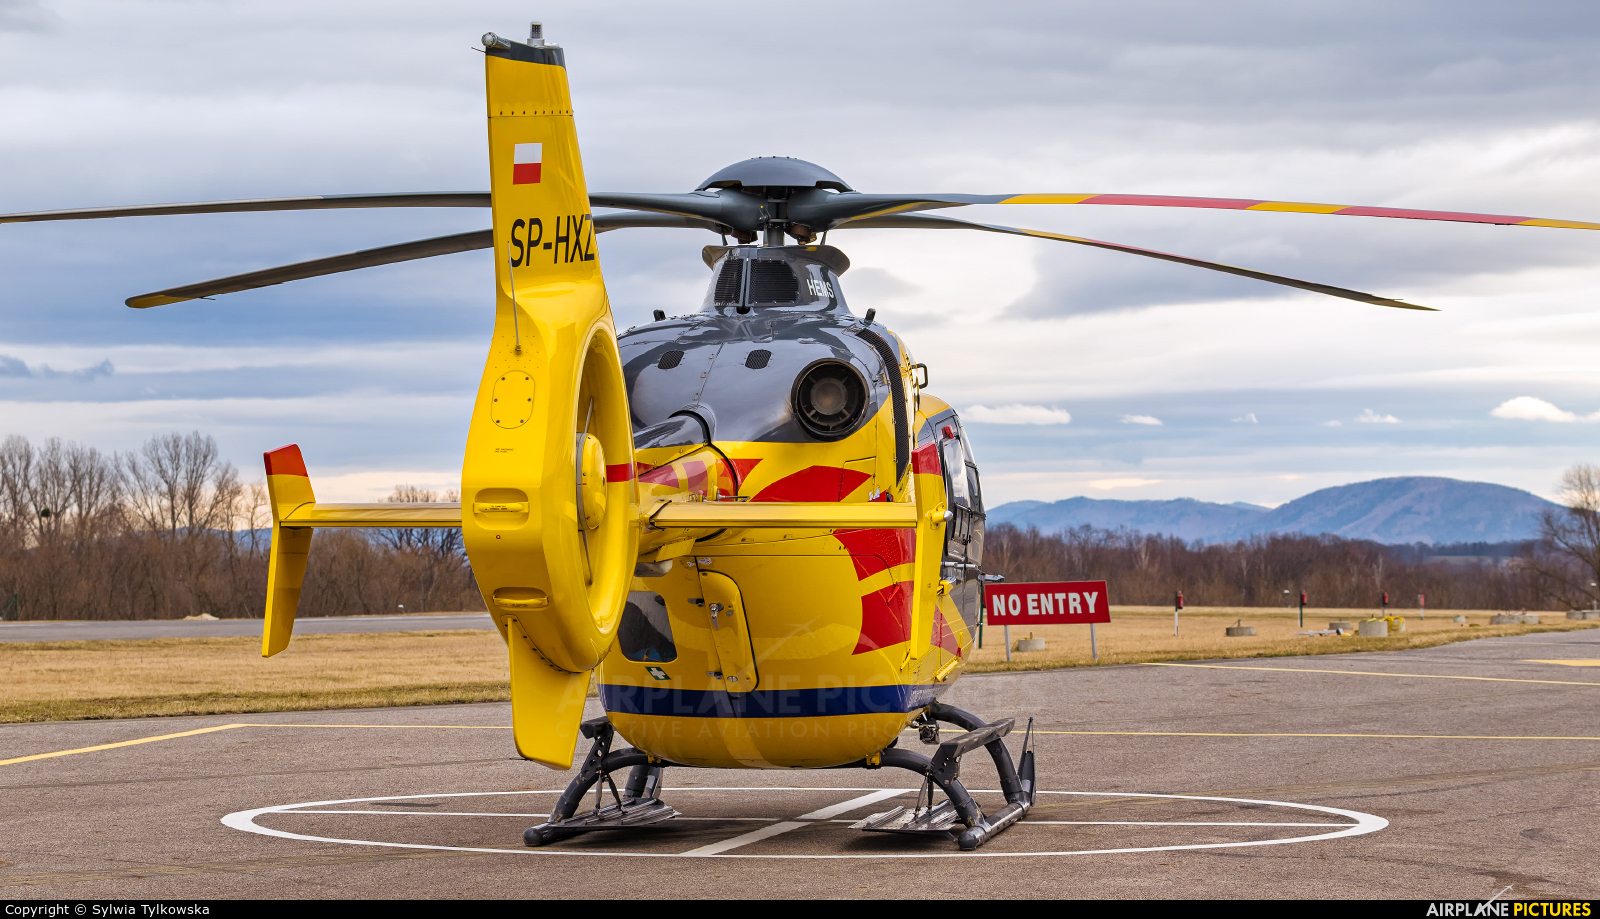 Polish Medical Air Rescue - Lotnicze Pogotowie Ratunkowe SP-HXZ aircraft at Kaniów